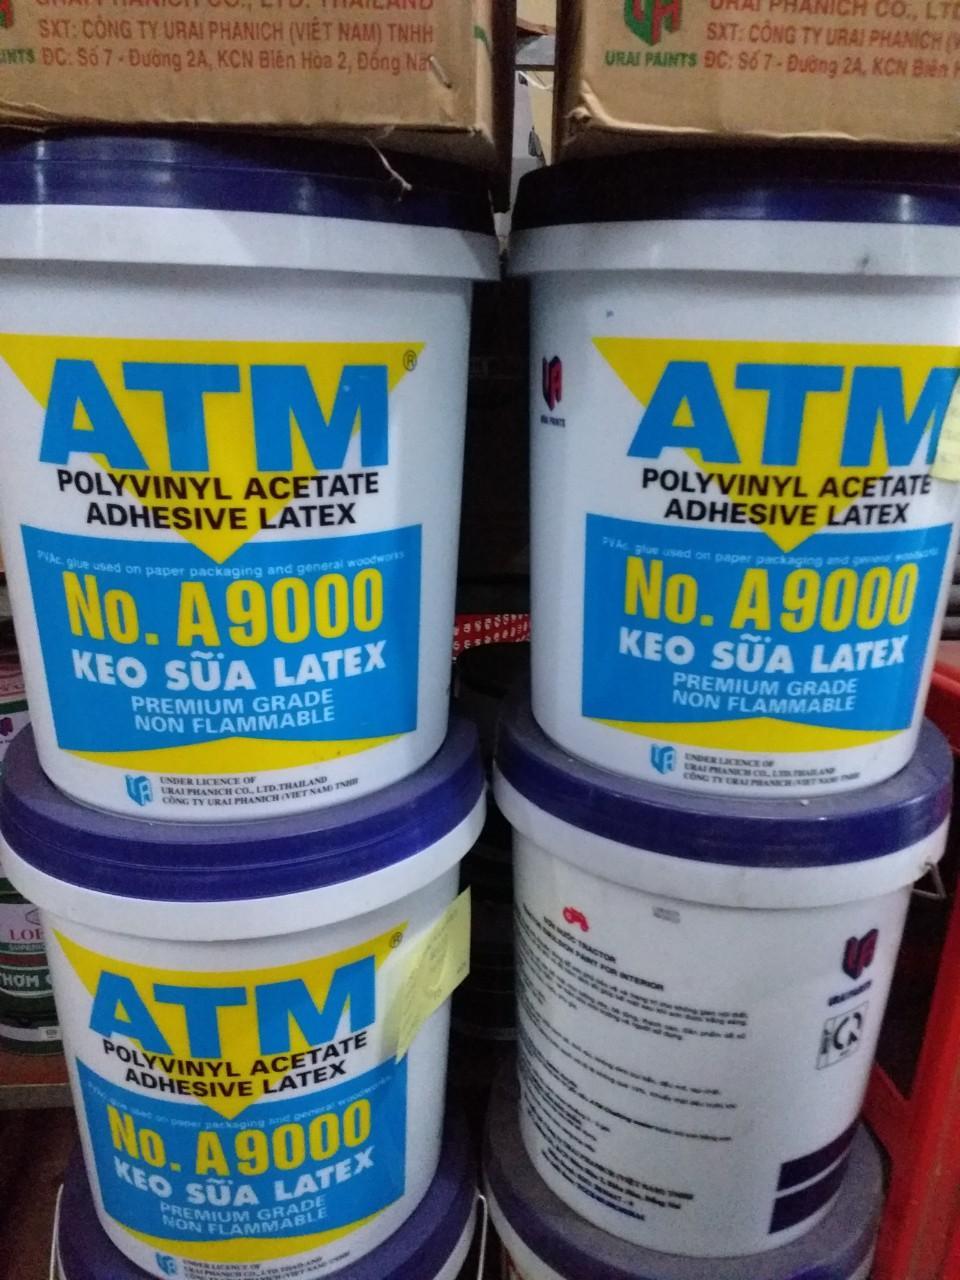 Keo sữa ATM Latex No. A9000 thùng 20KG